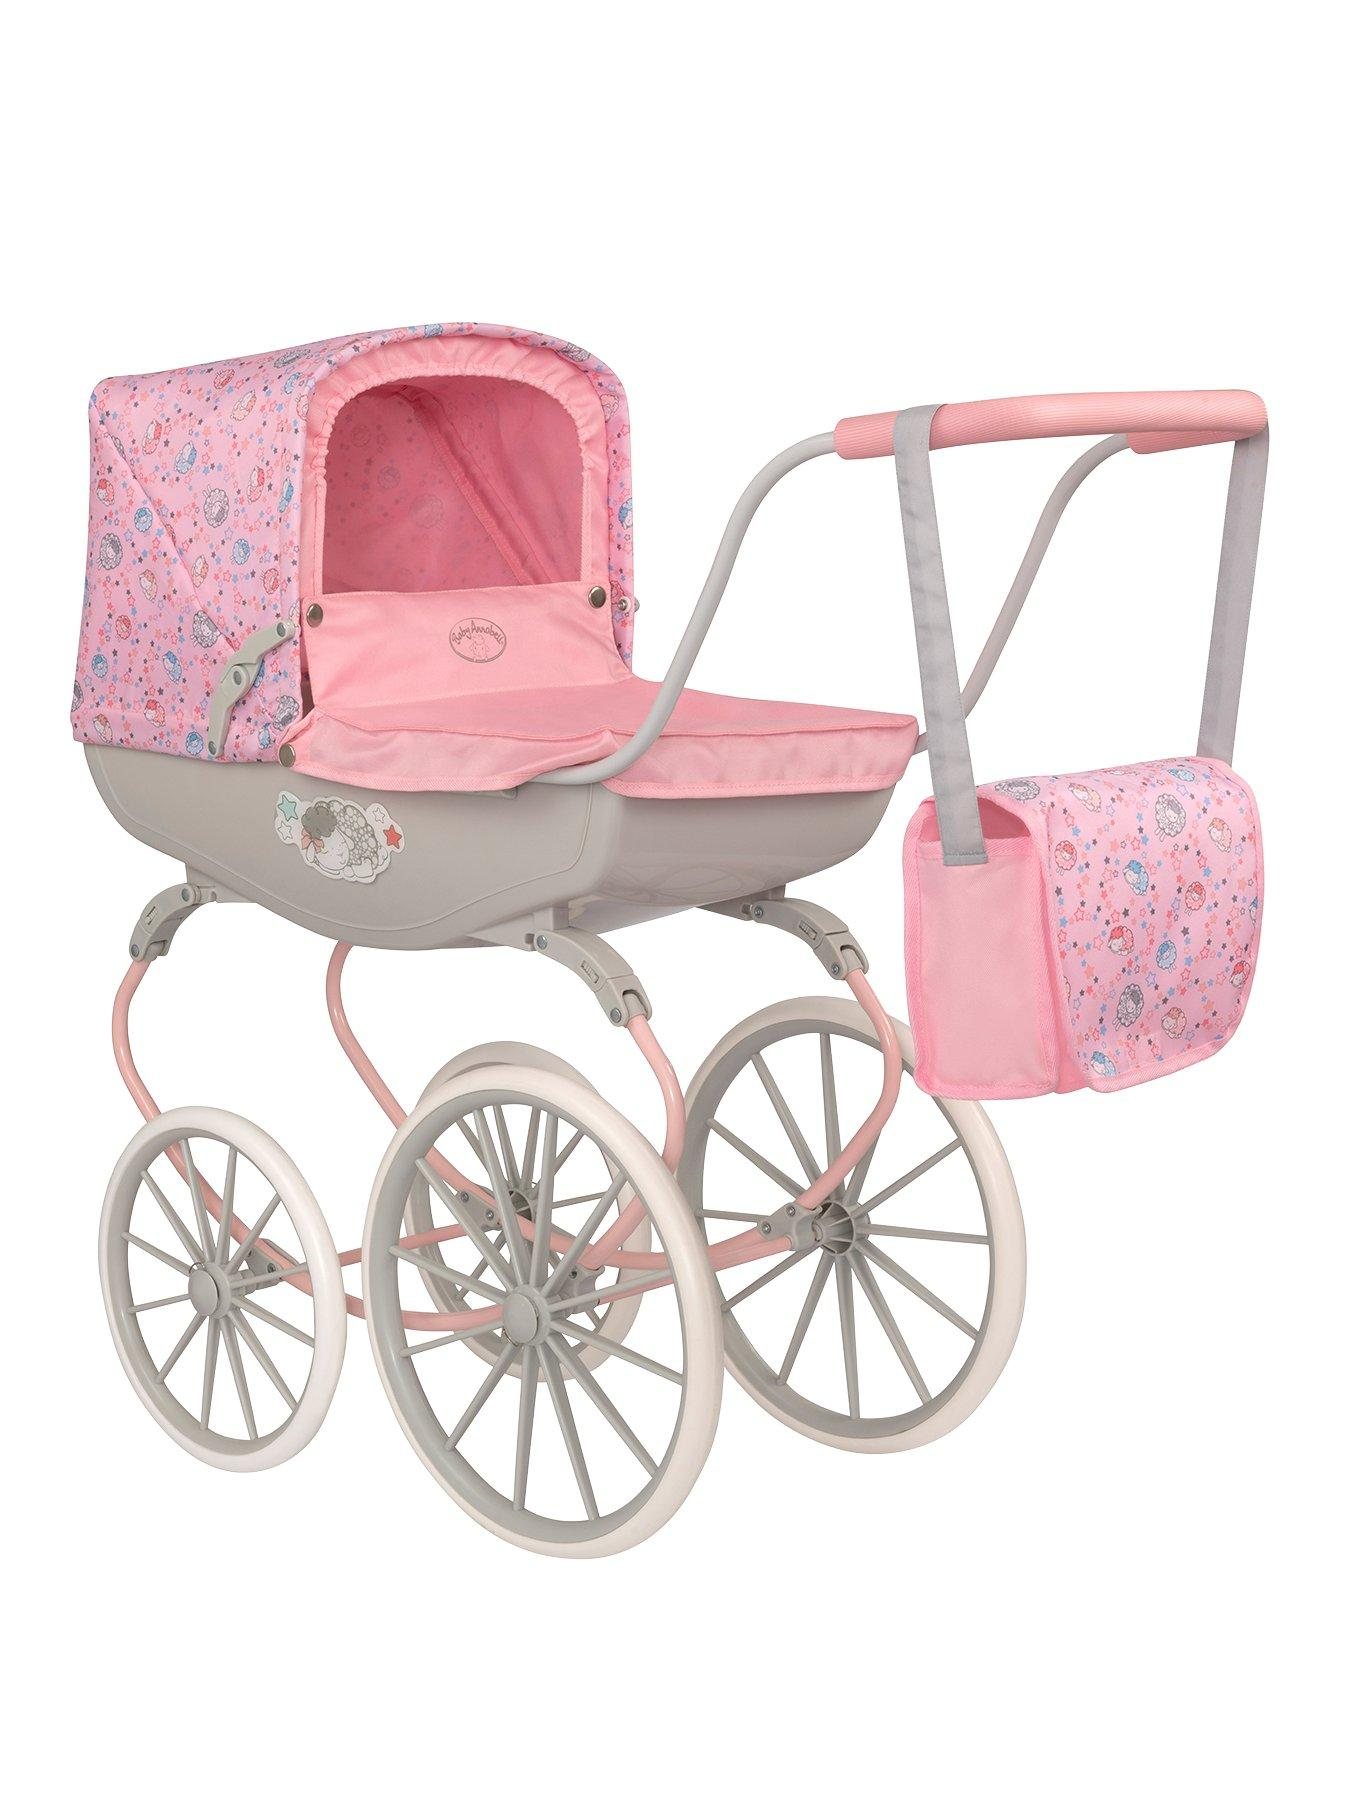 DOLLS PRAM BLANKET /& PILLOW COT BEDDING SET PURPLE VINTAGE FLORAL BABY ANNABELL